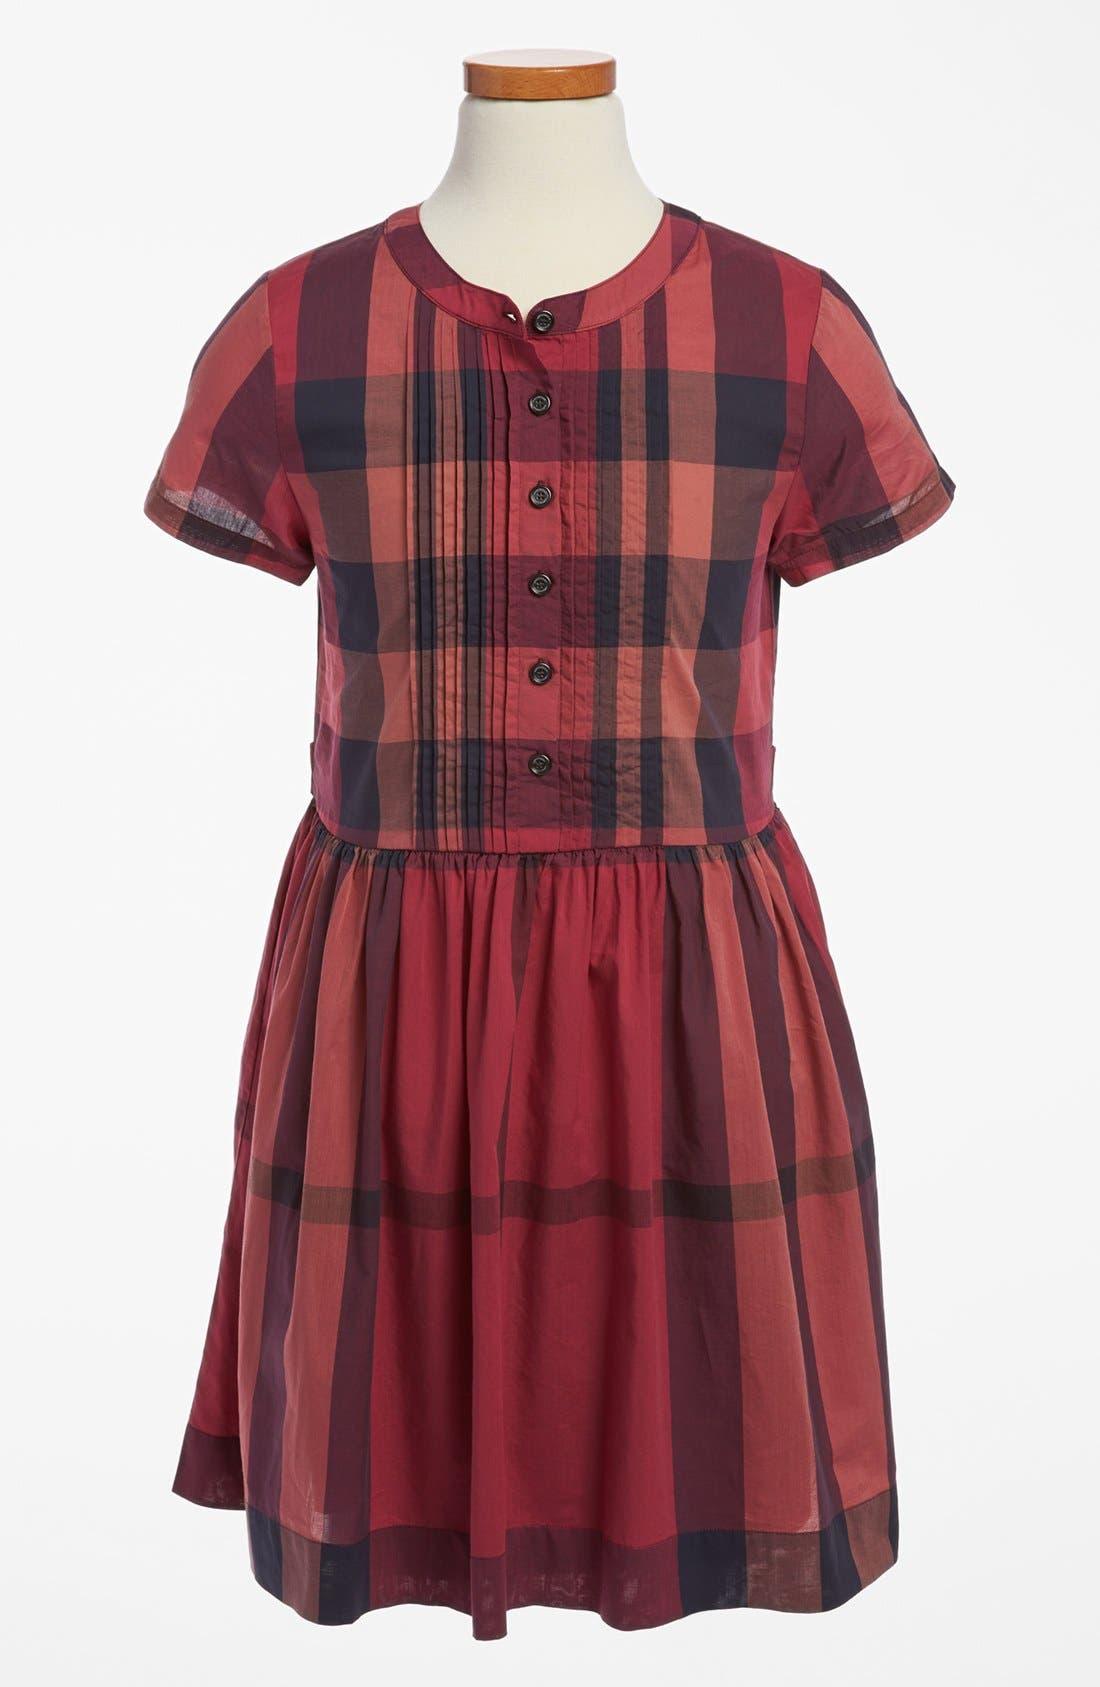 Main Image - Burberry 'Dally' Dress (Little Girls & Big Girls)